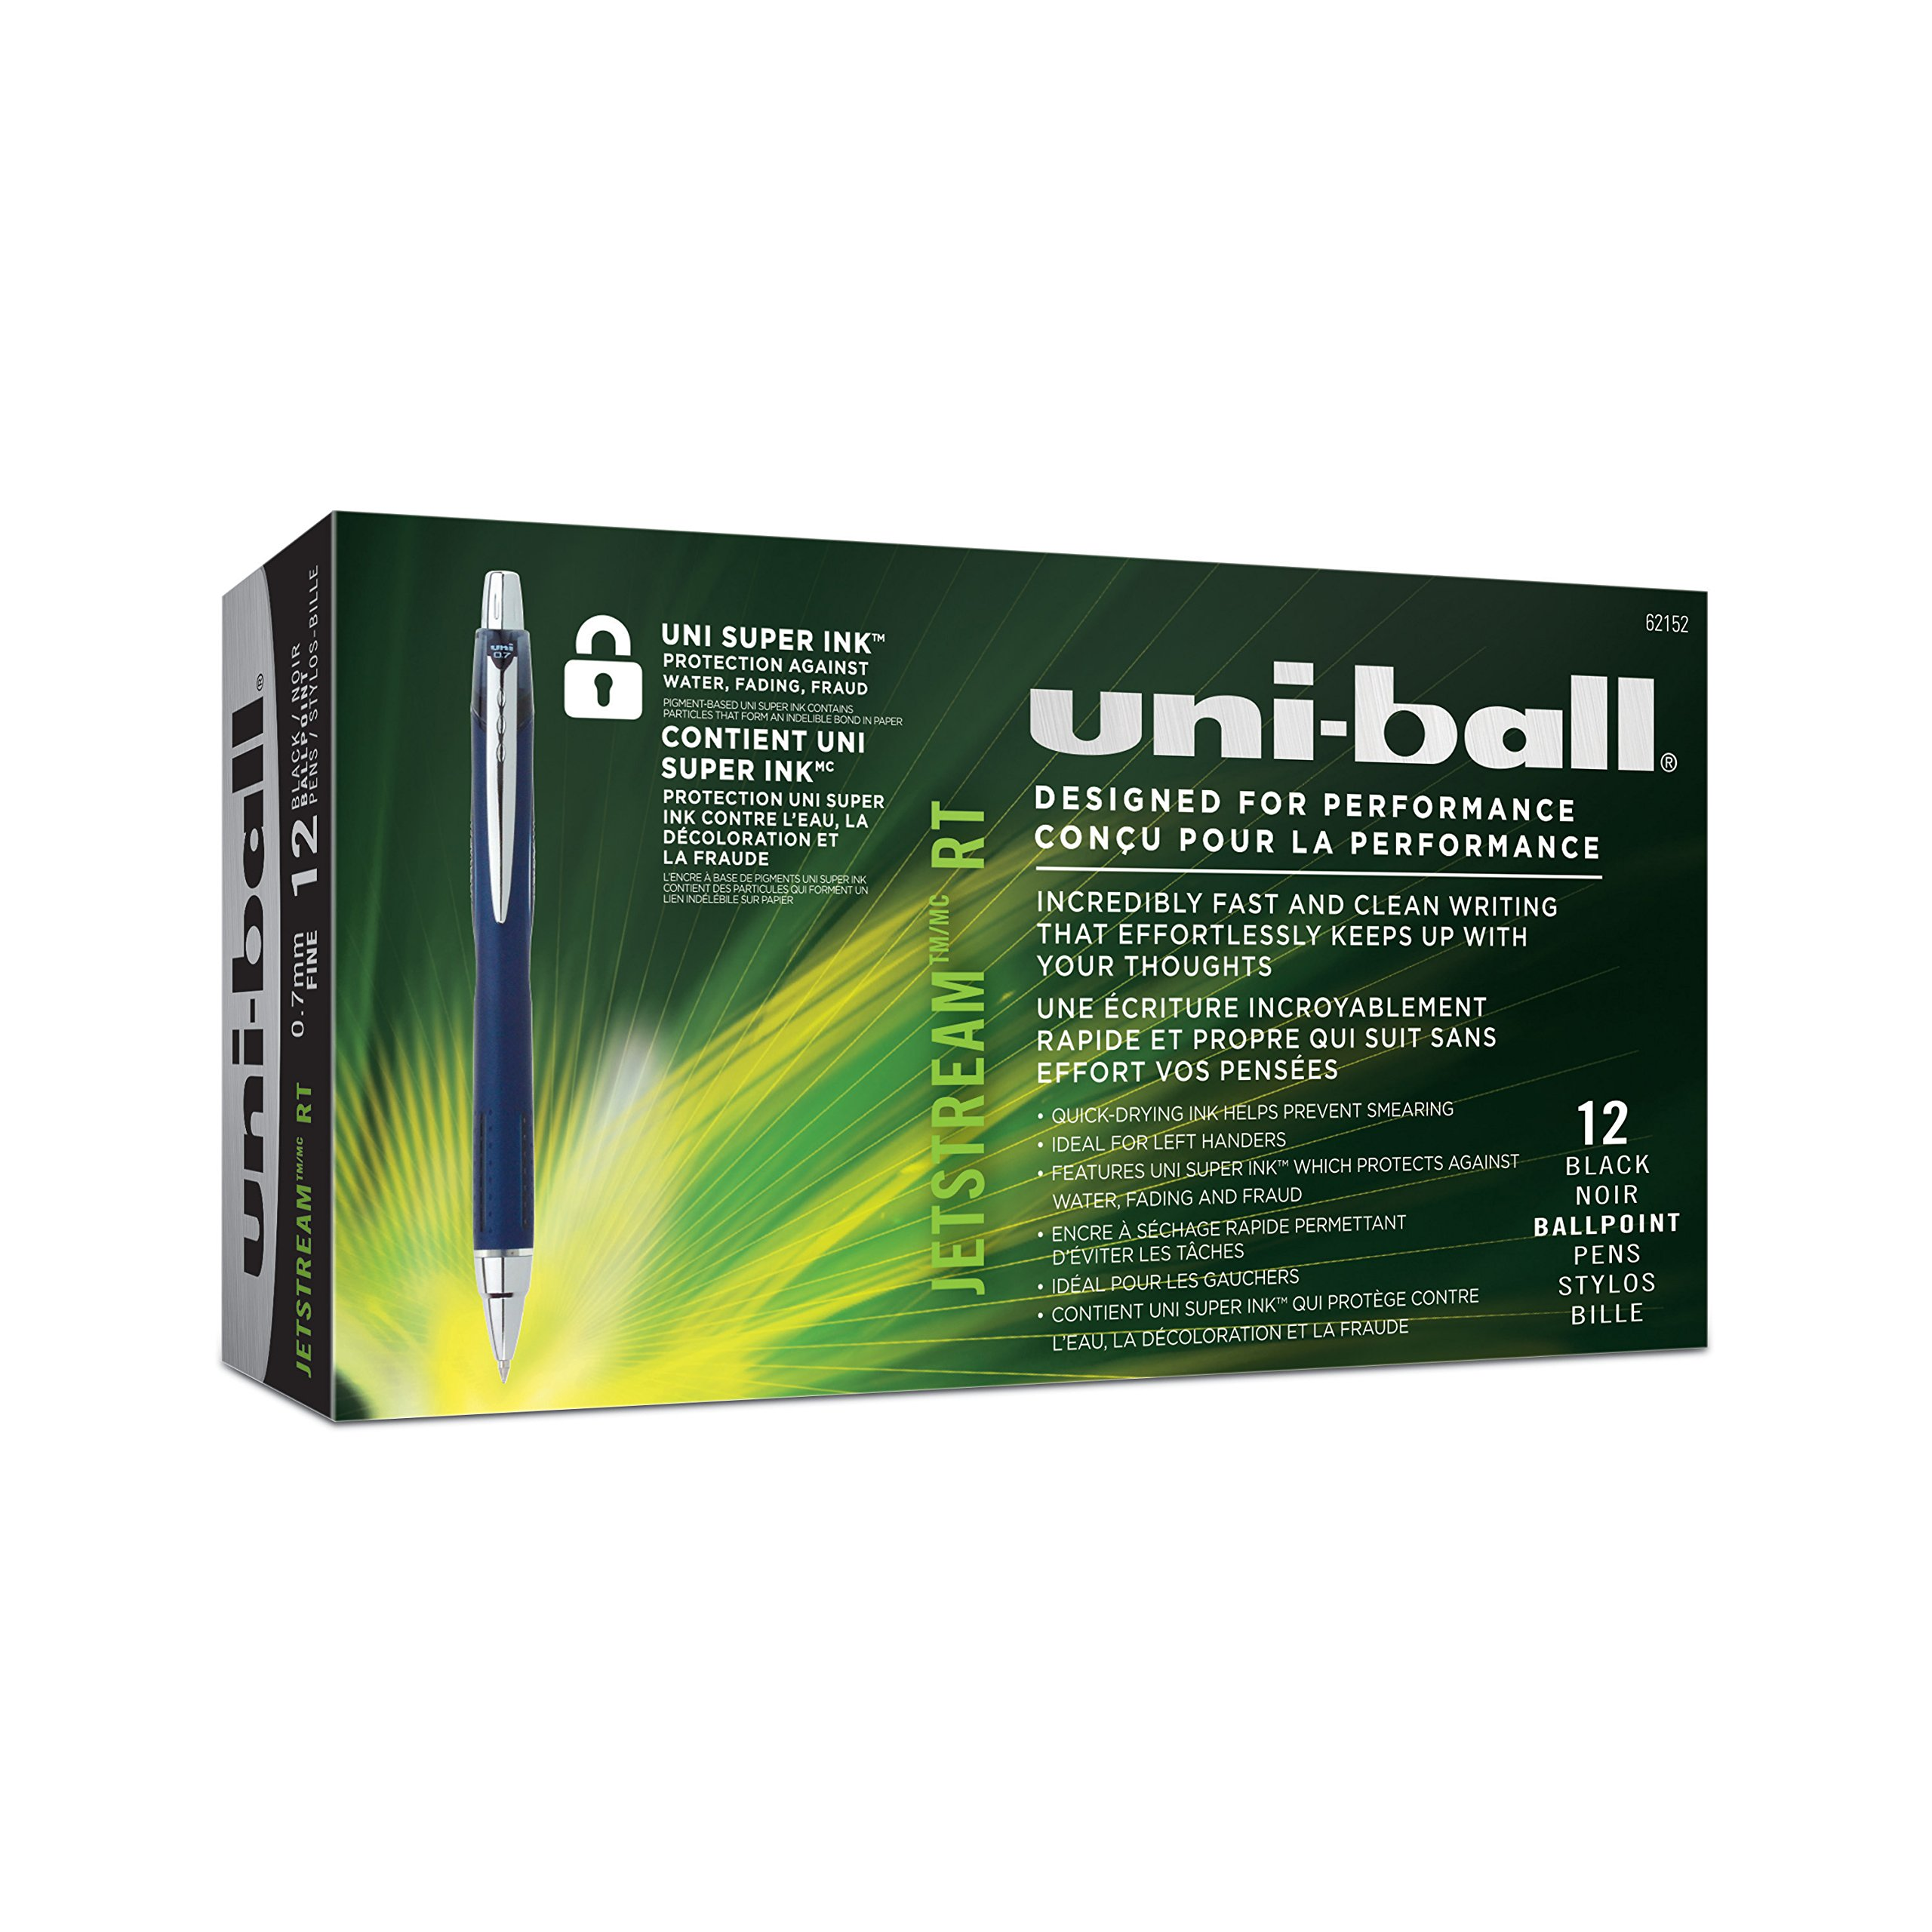 uni-ball Jetstream RT Ballpoint Pens, Fine Point (0.7mm), Black, 12 Count by Sharpie (Image #8)